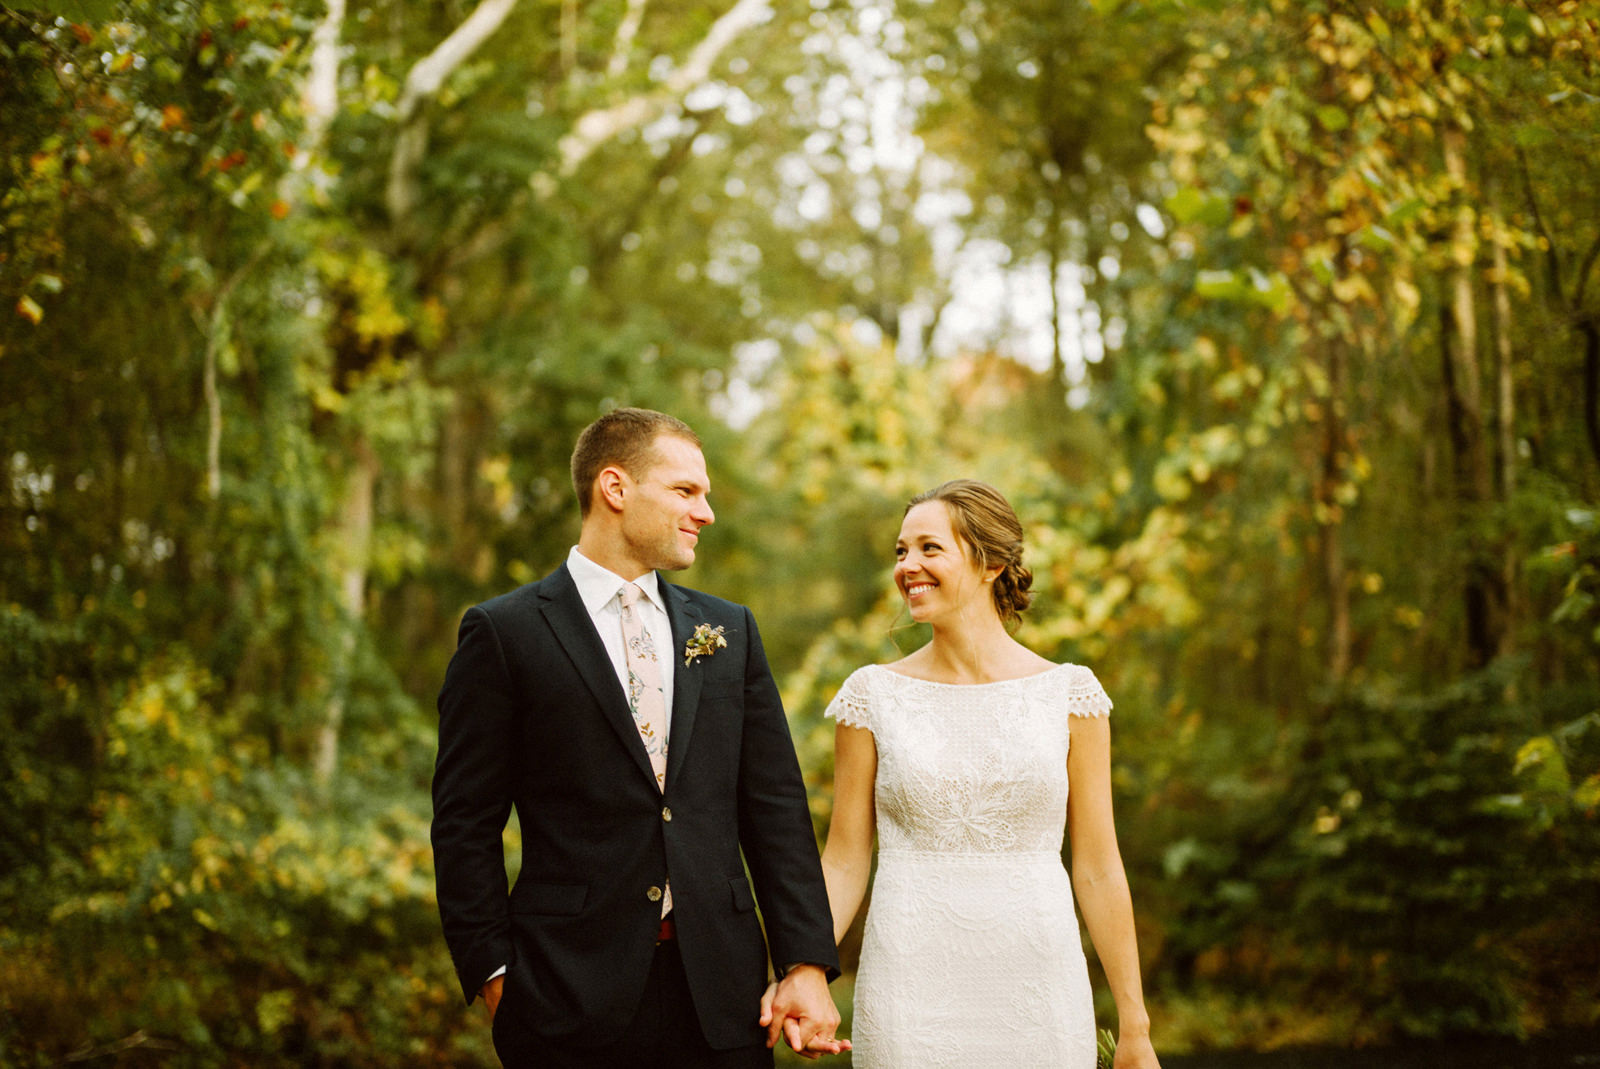 bridgeport-wedding-116 BRIDGEPORT, CONNECTICUT BACKYARD WEDDING